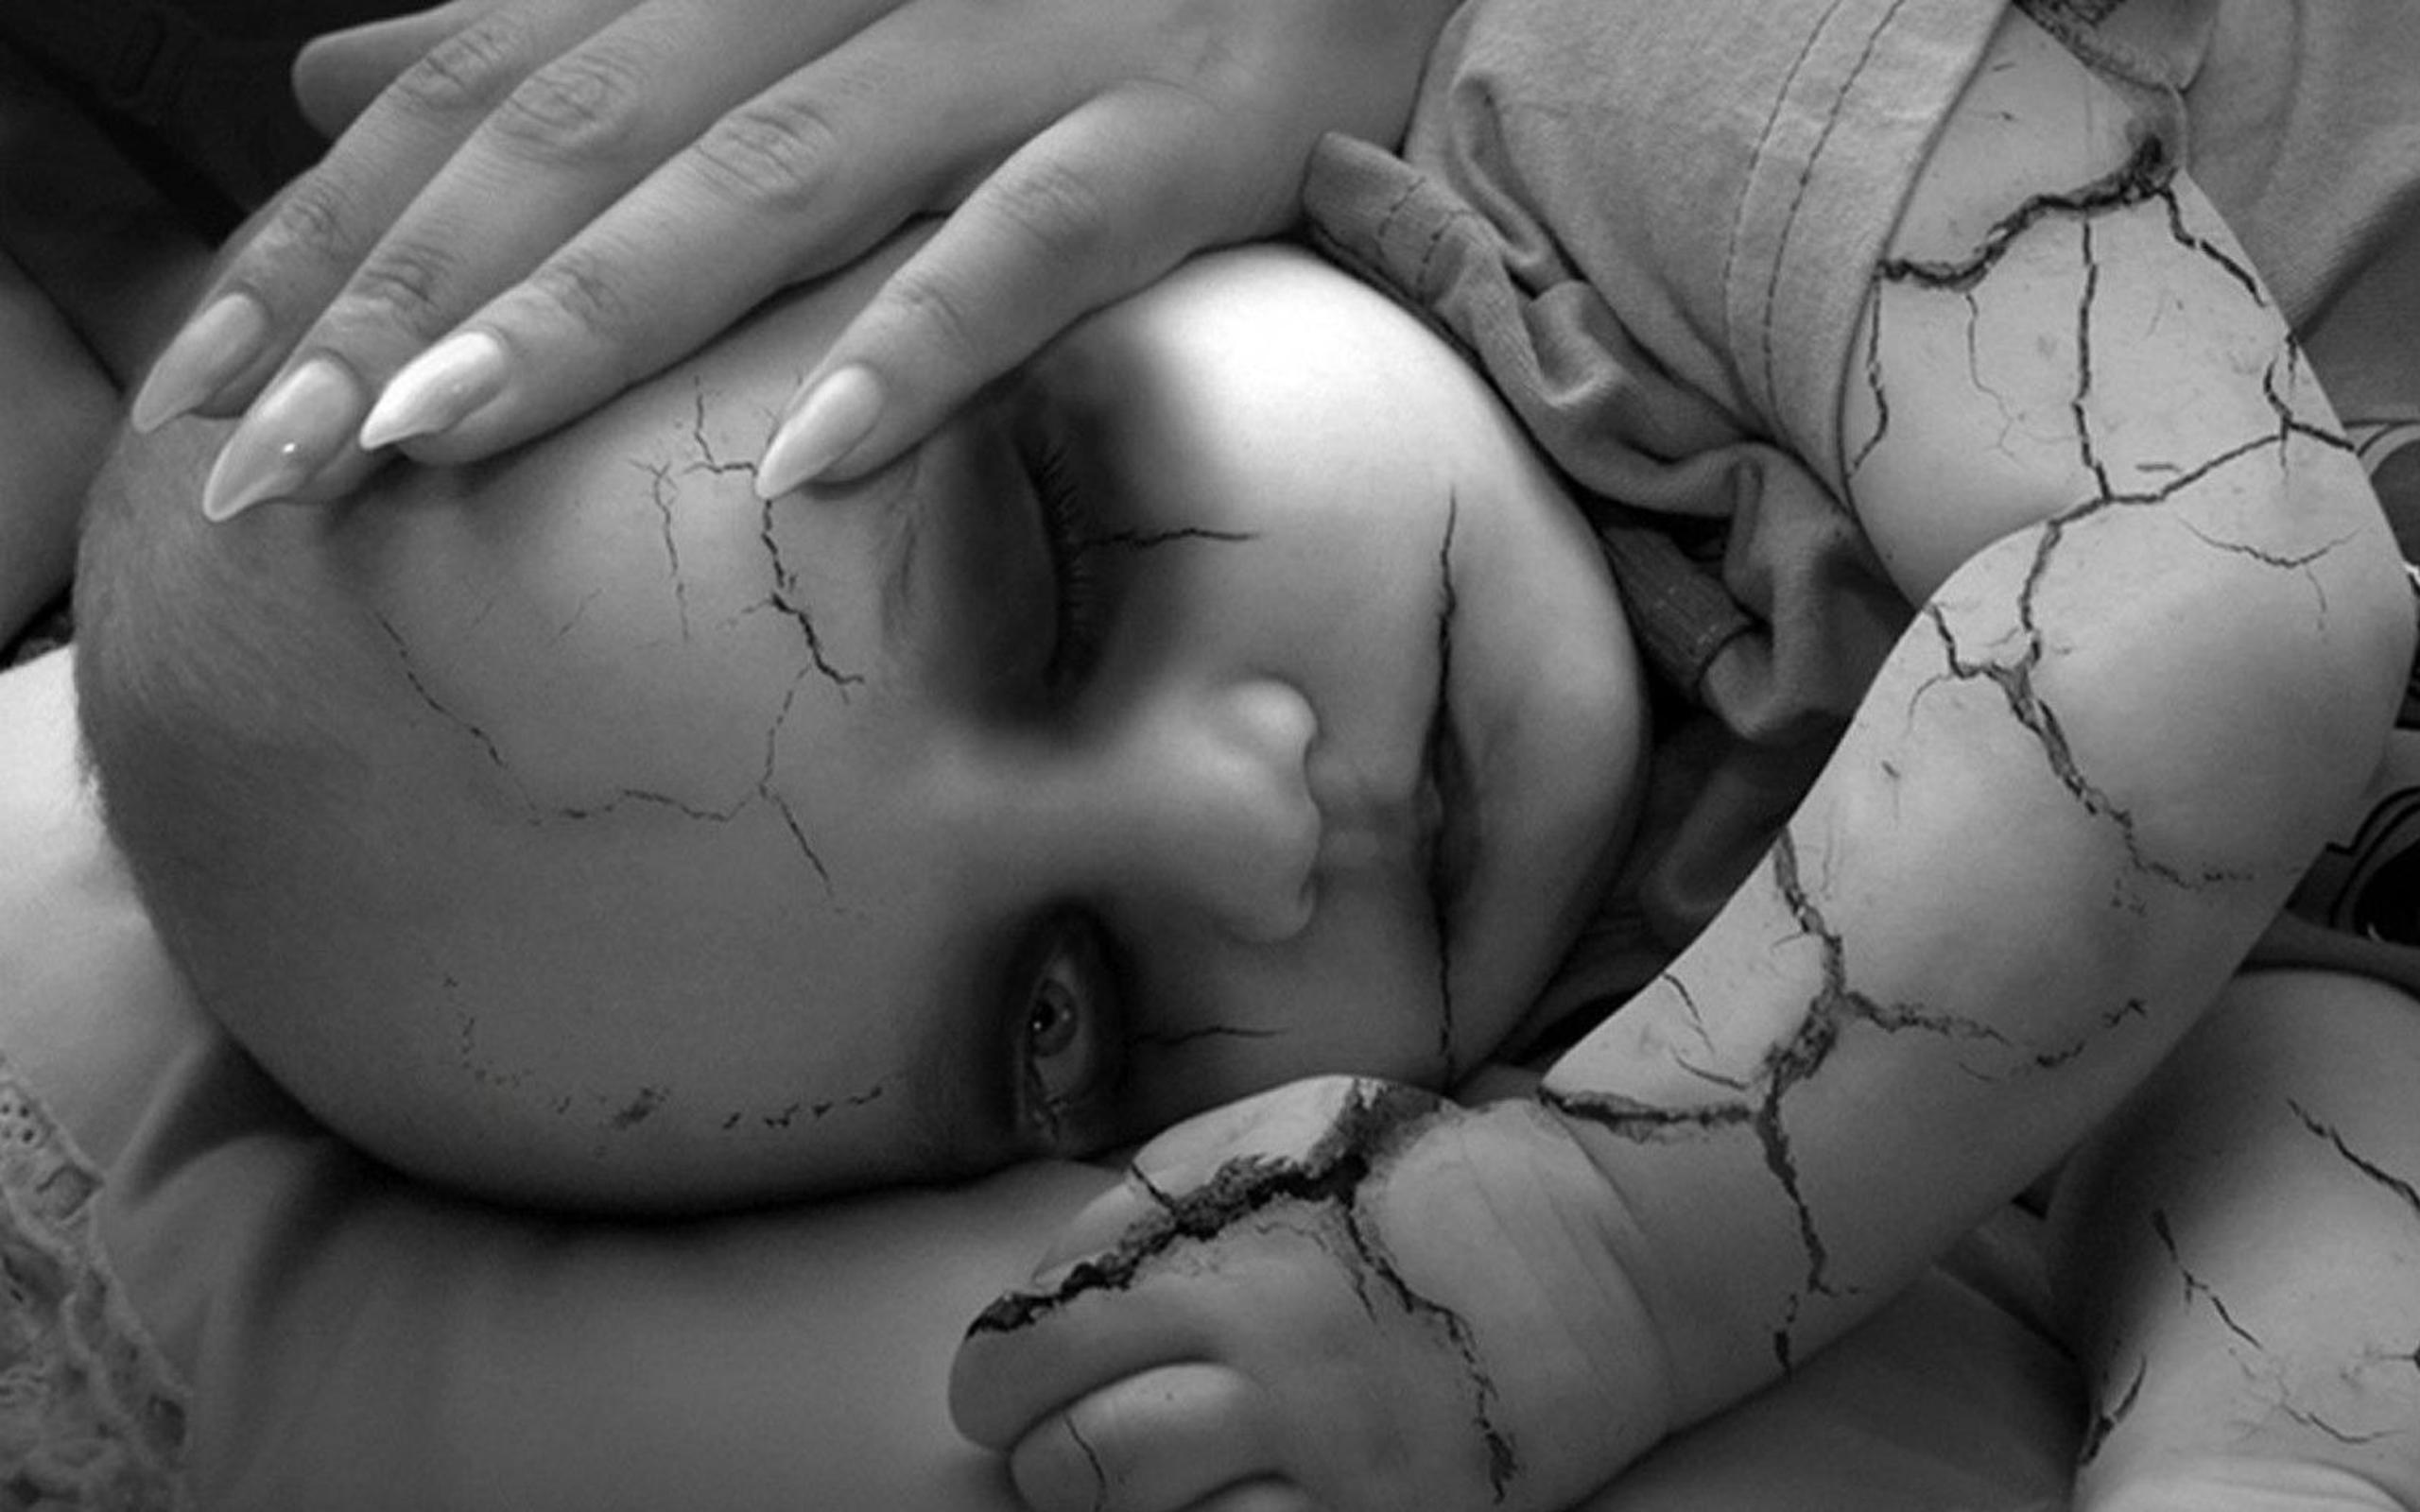 Scary Wallpapers Desktop Background Hd Wallpaper - Dark Baby Art - HD Wallpaper